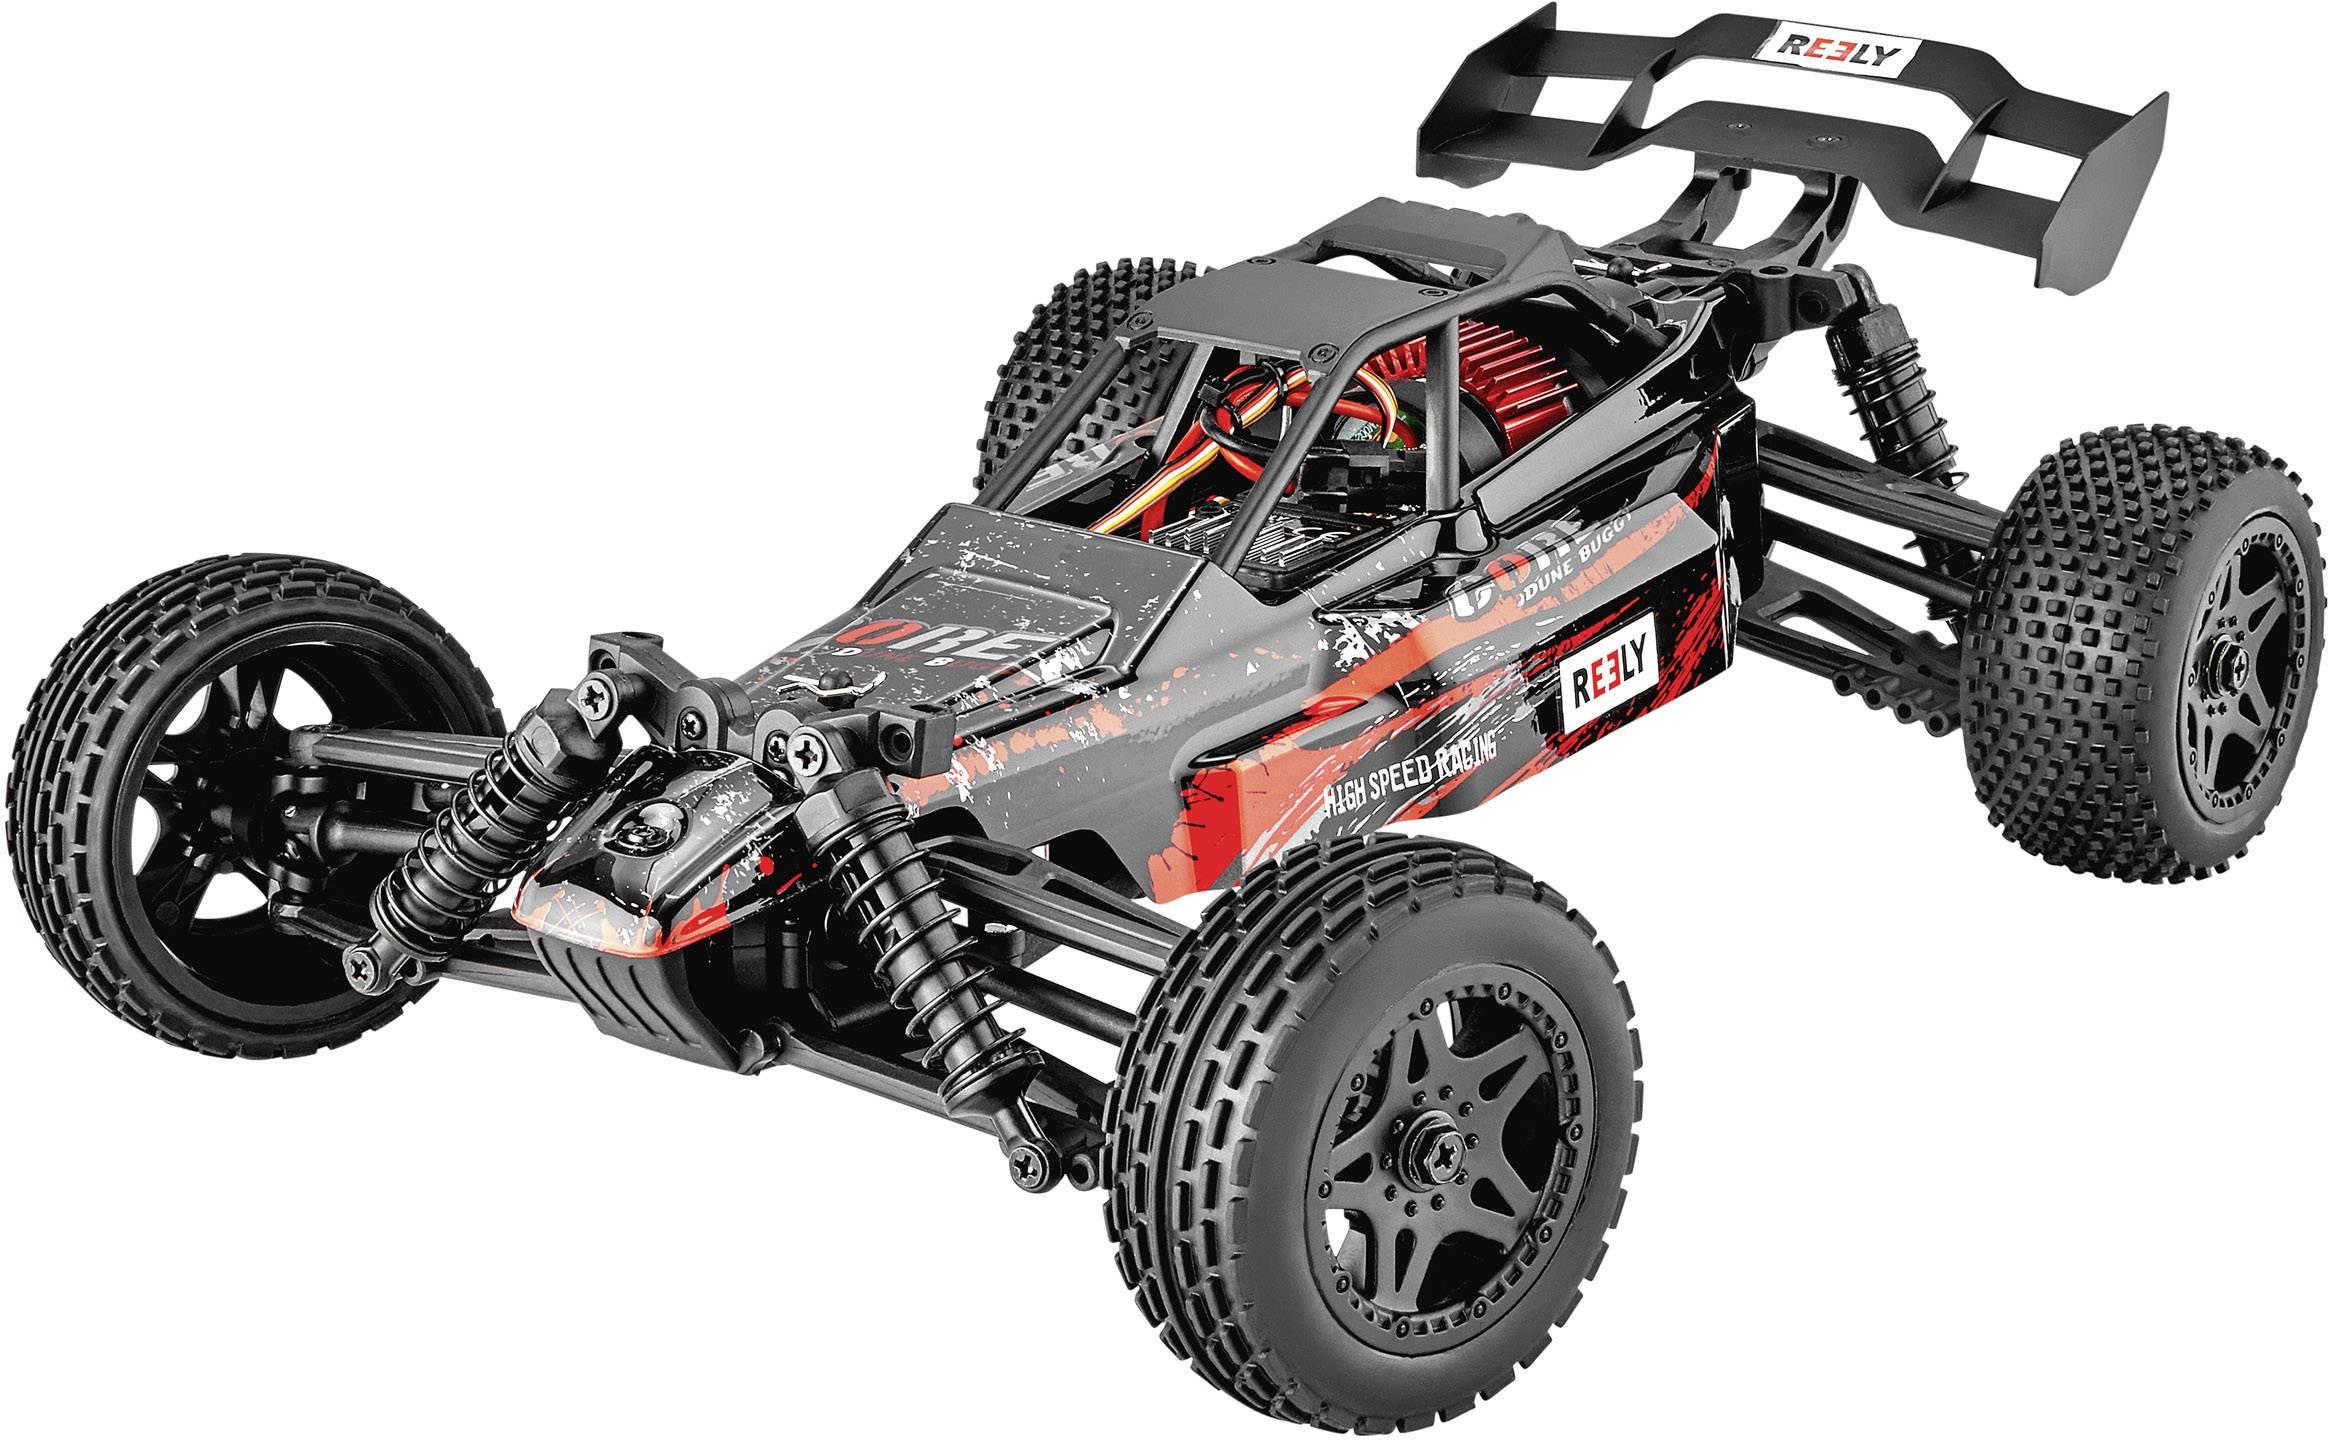 Elektrický RC model auta Reely Core Buggy RtR,1:10 XS, komutátorový, 4WD (4x4), 2,4 GHz